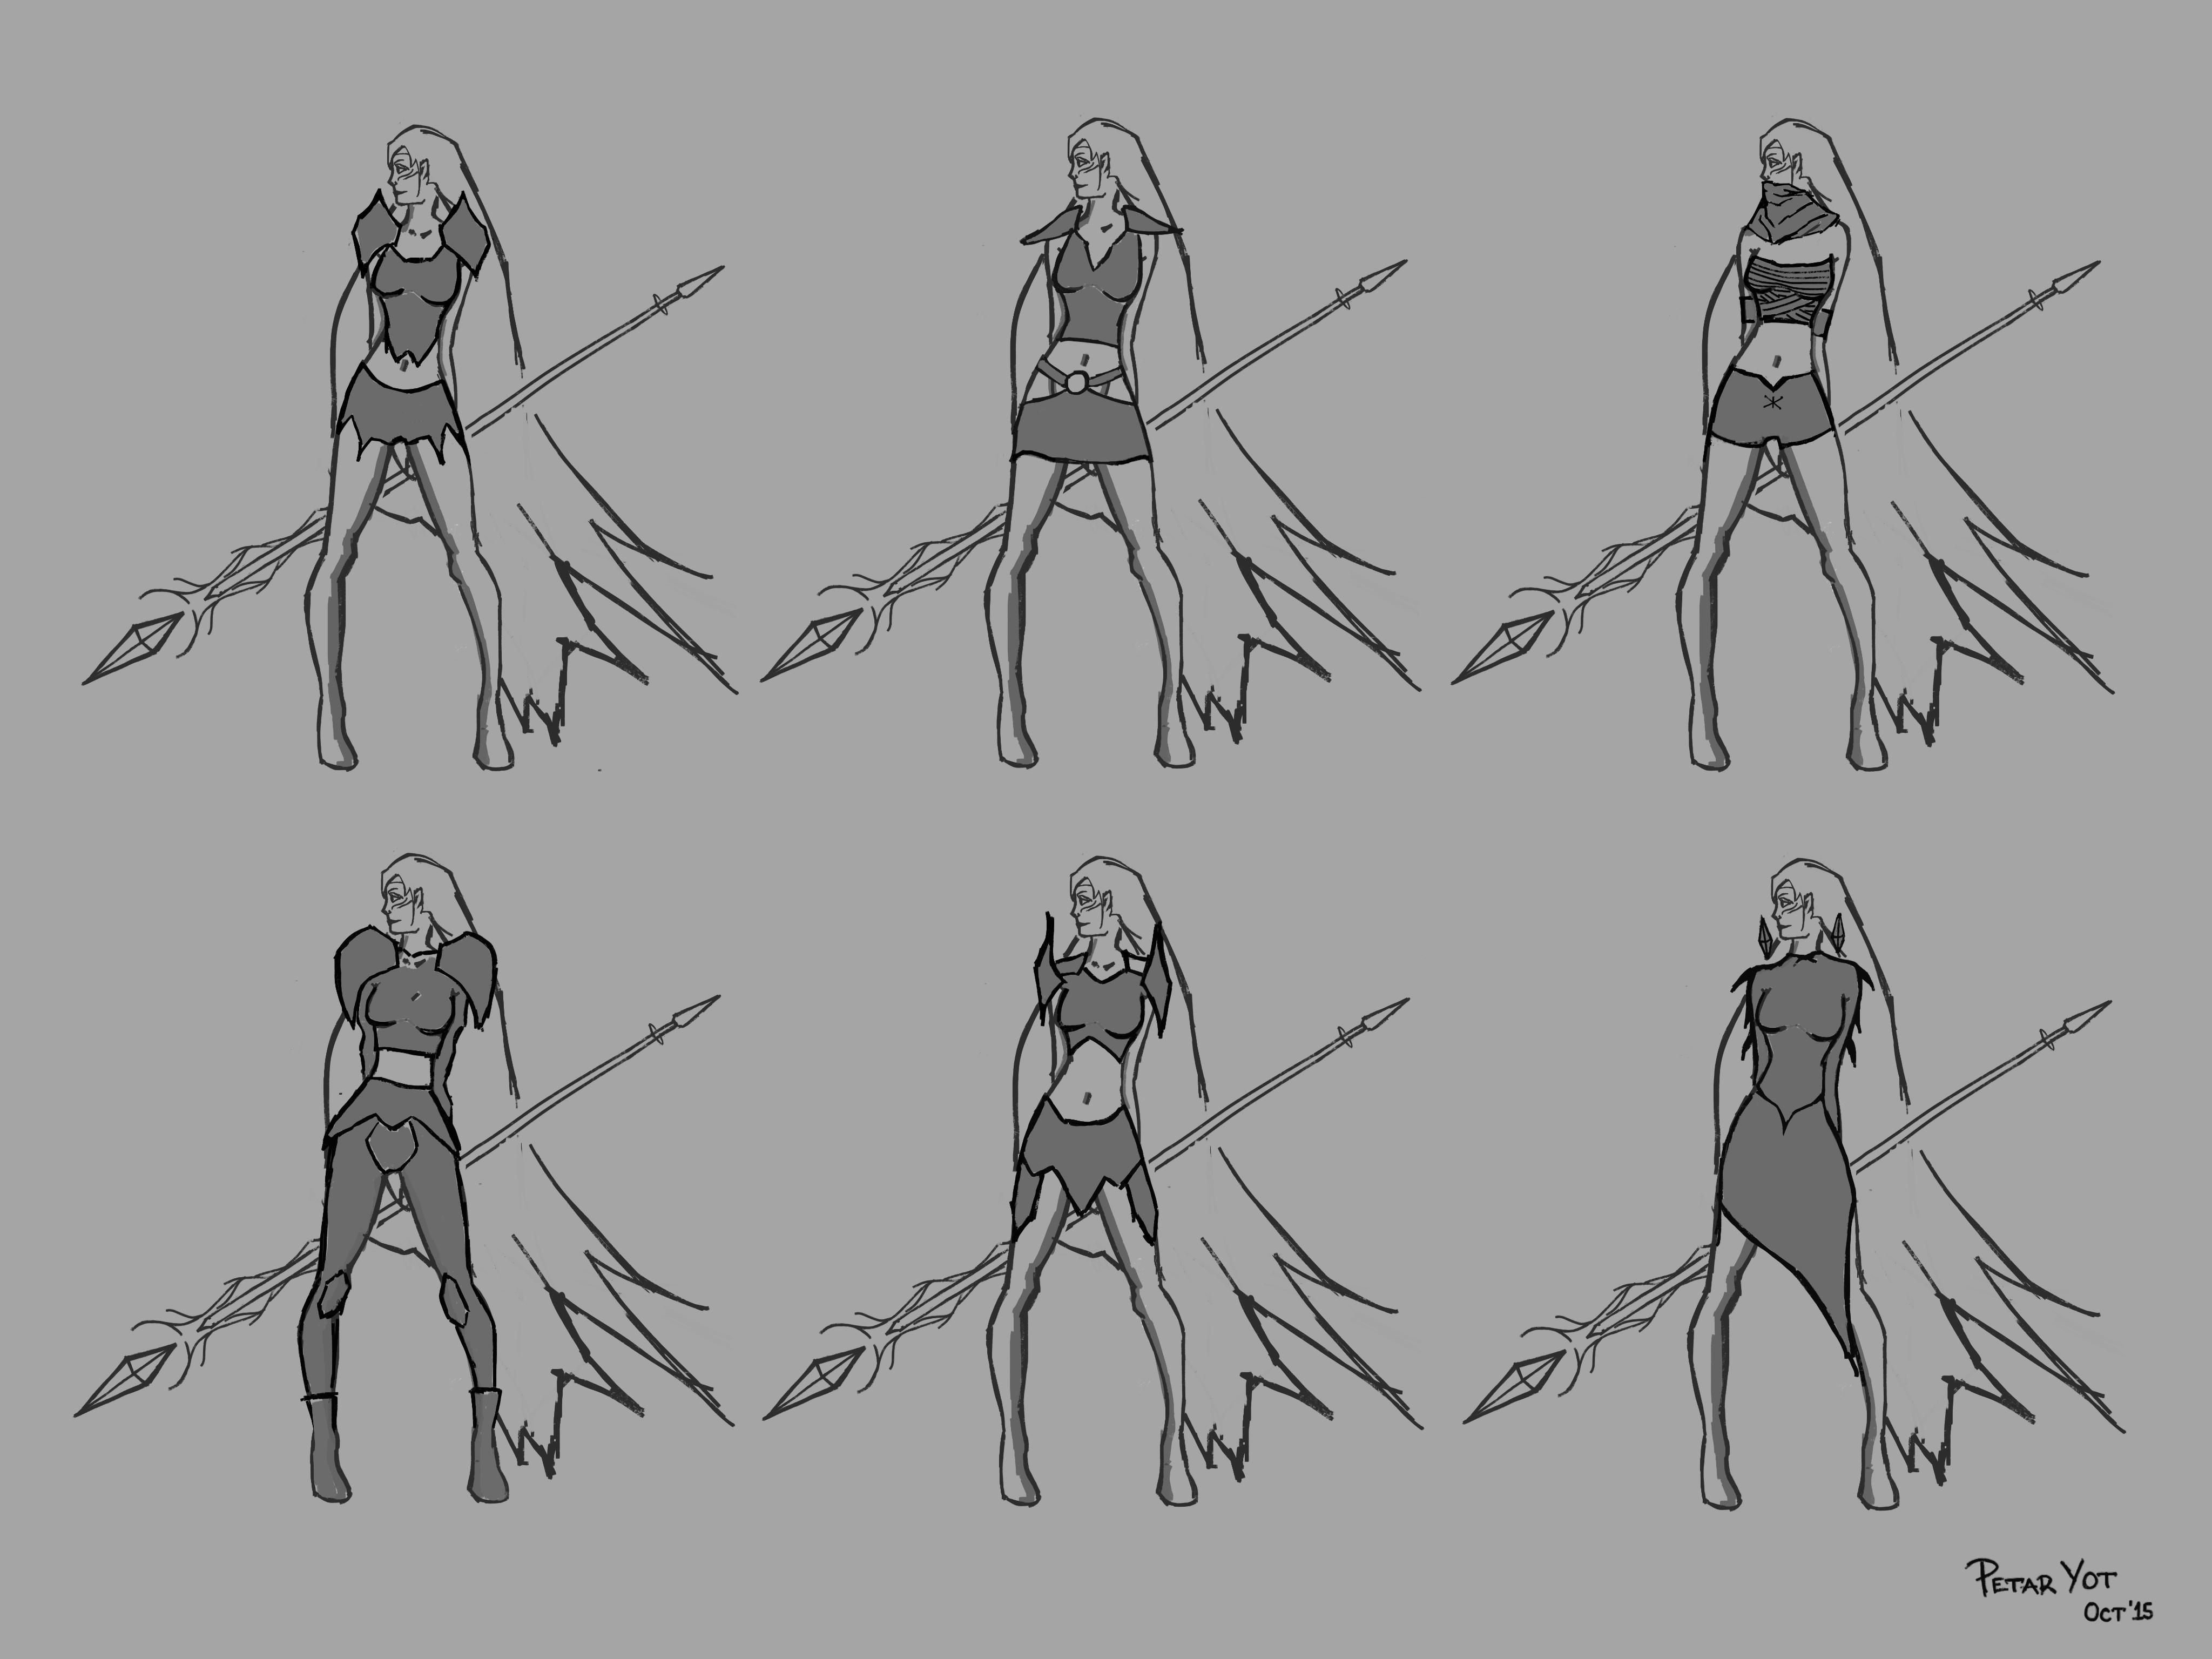 Arieya - WIP (Early armour ideas)